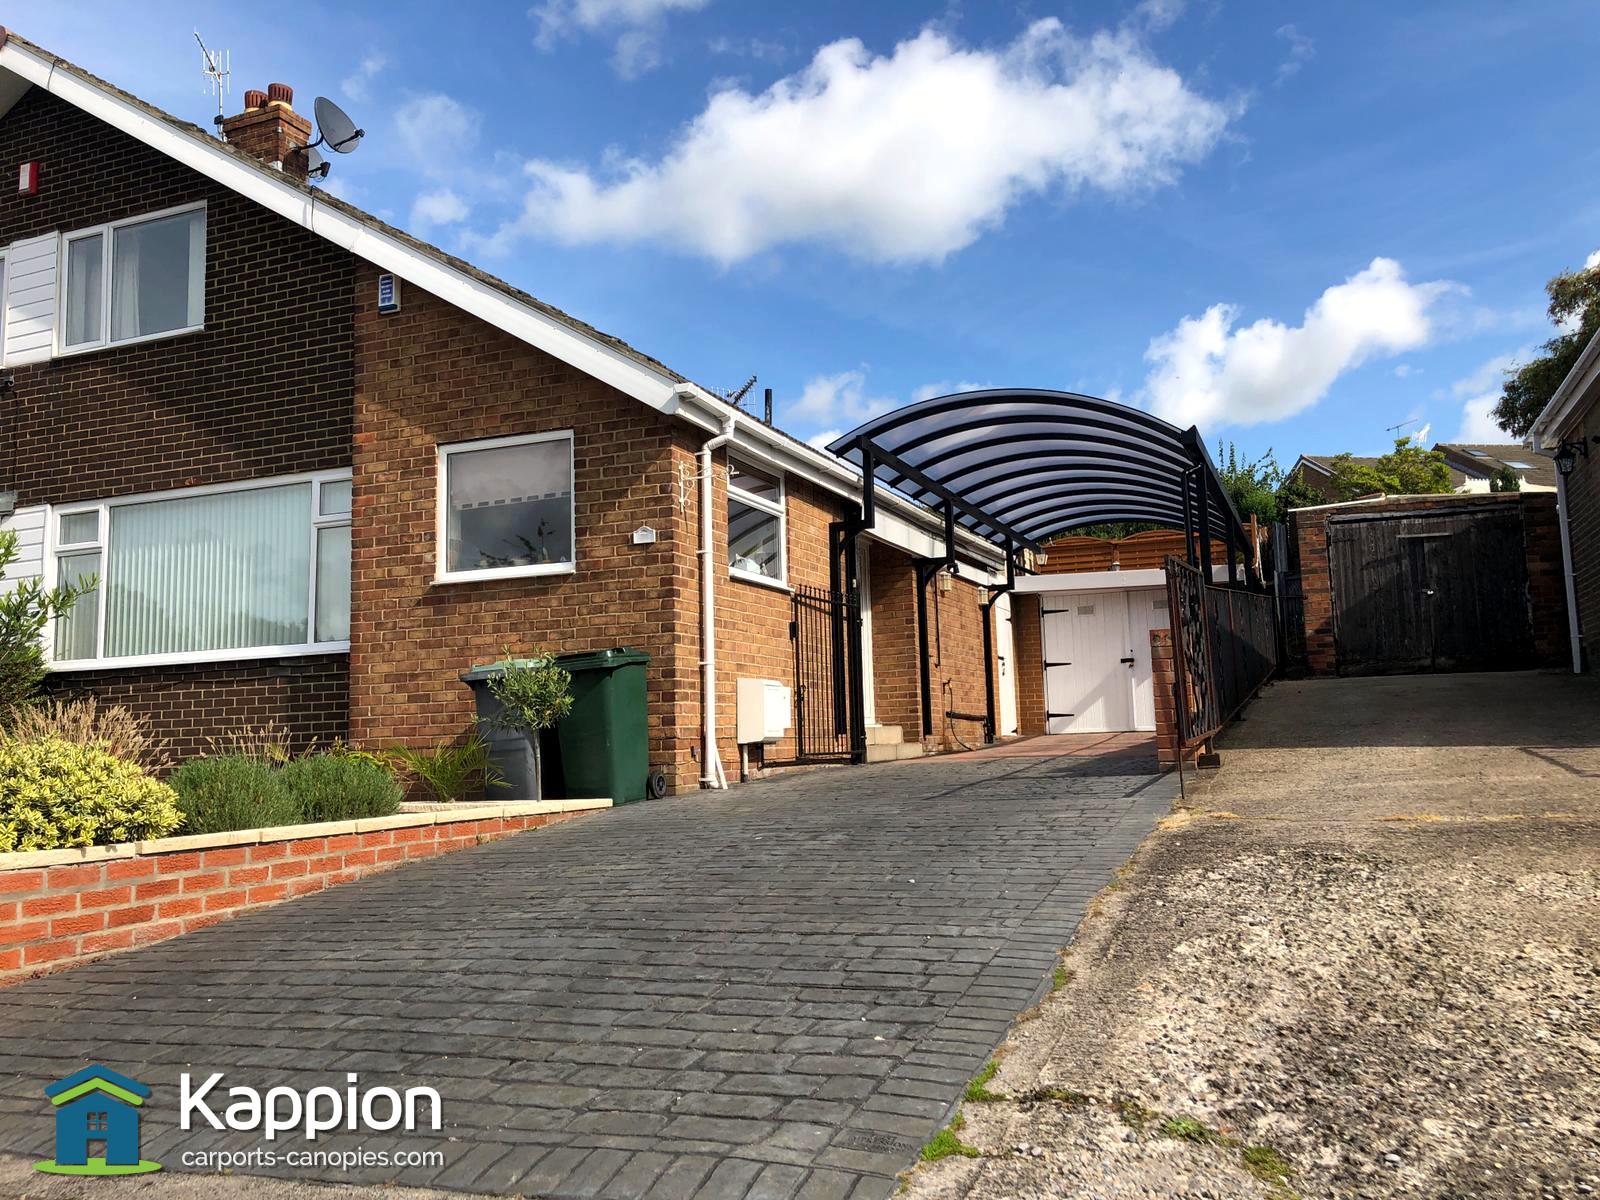 Motorhome Canopy installed in Bradford | Kappion Carports ...